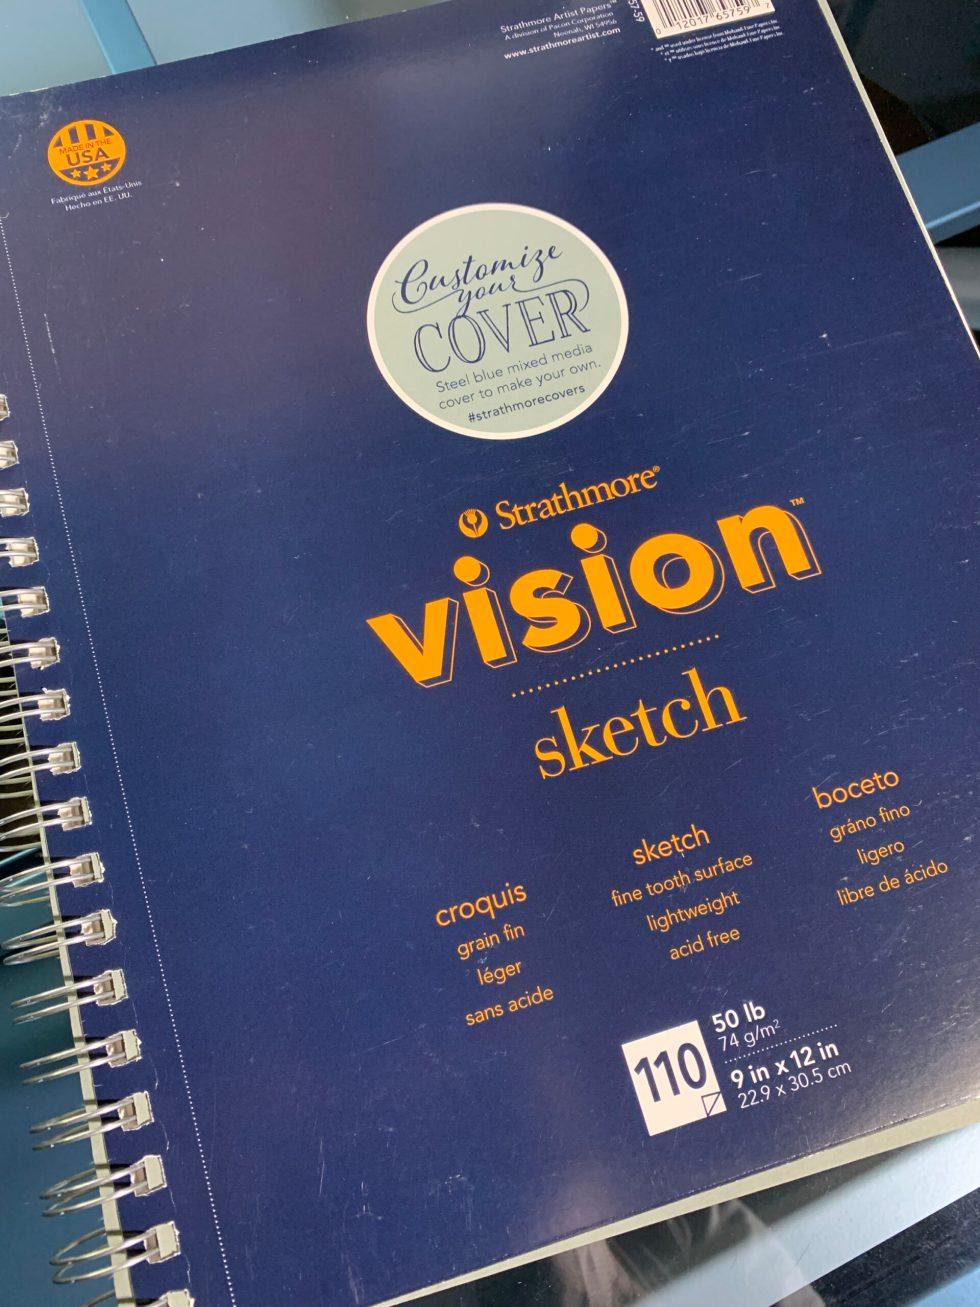 Strathmore Vision Sketch Paper image 2